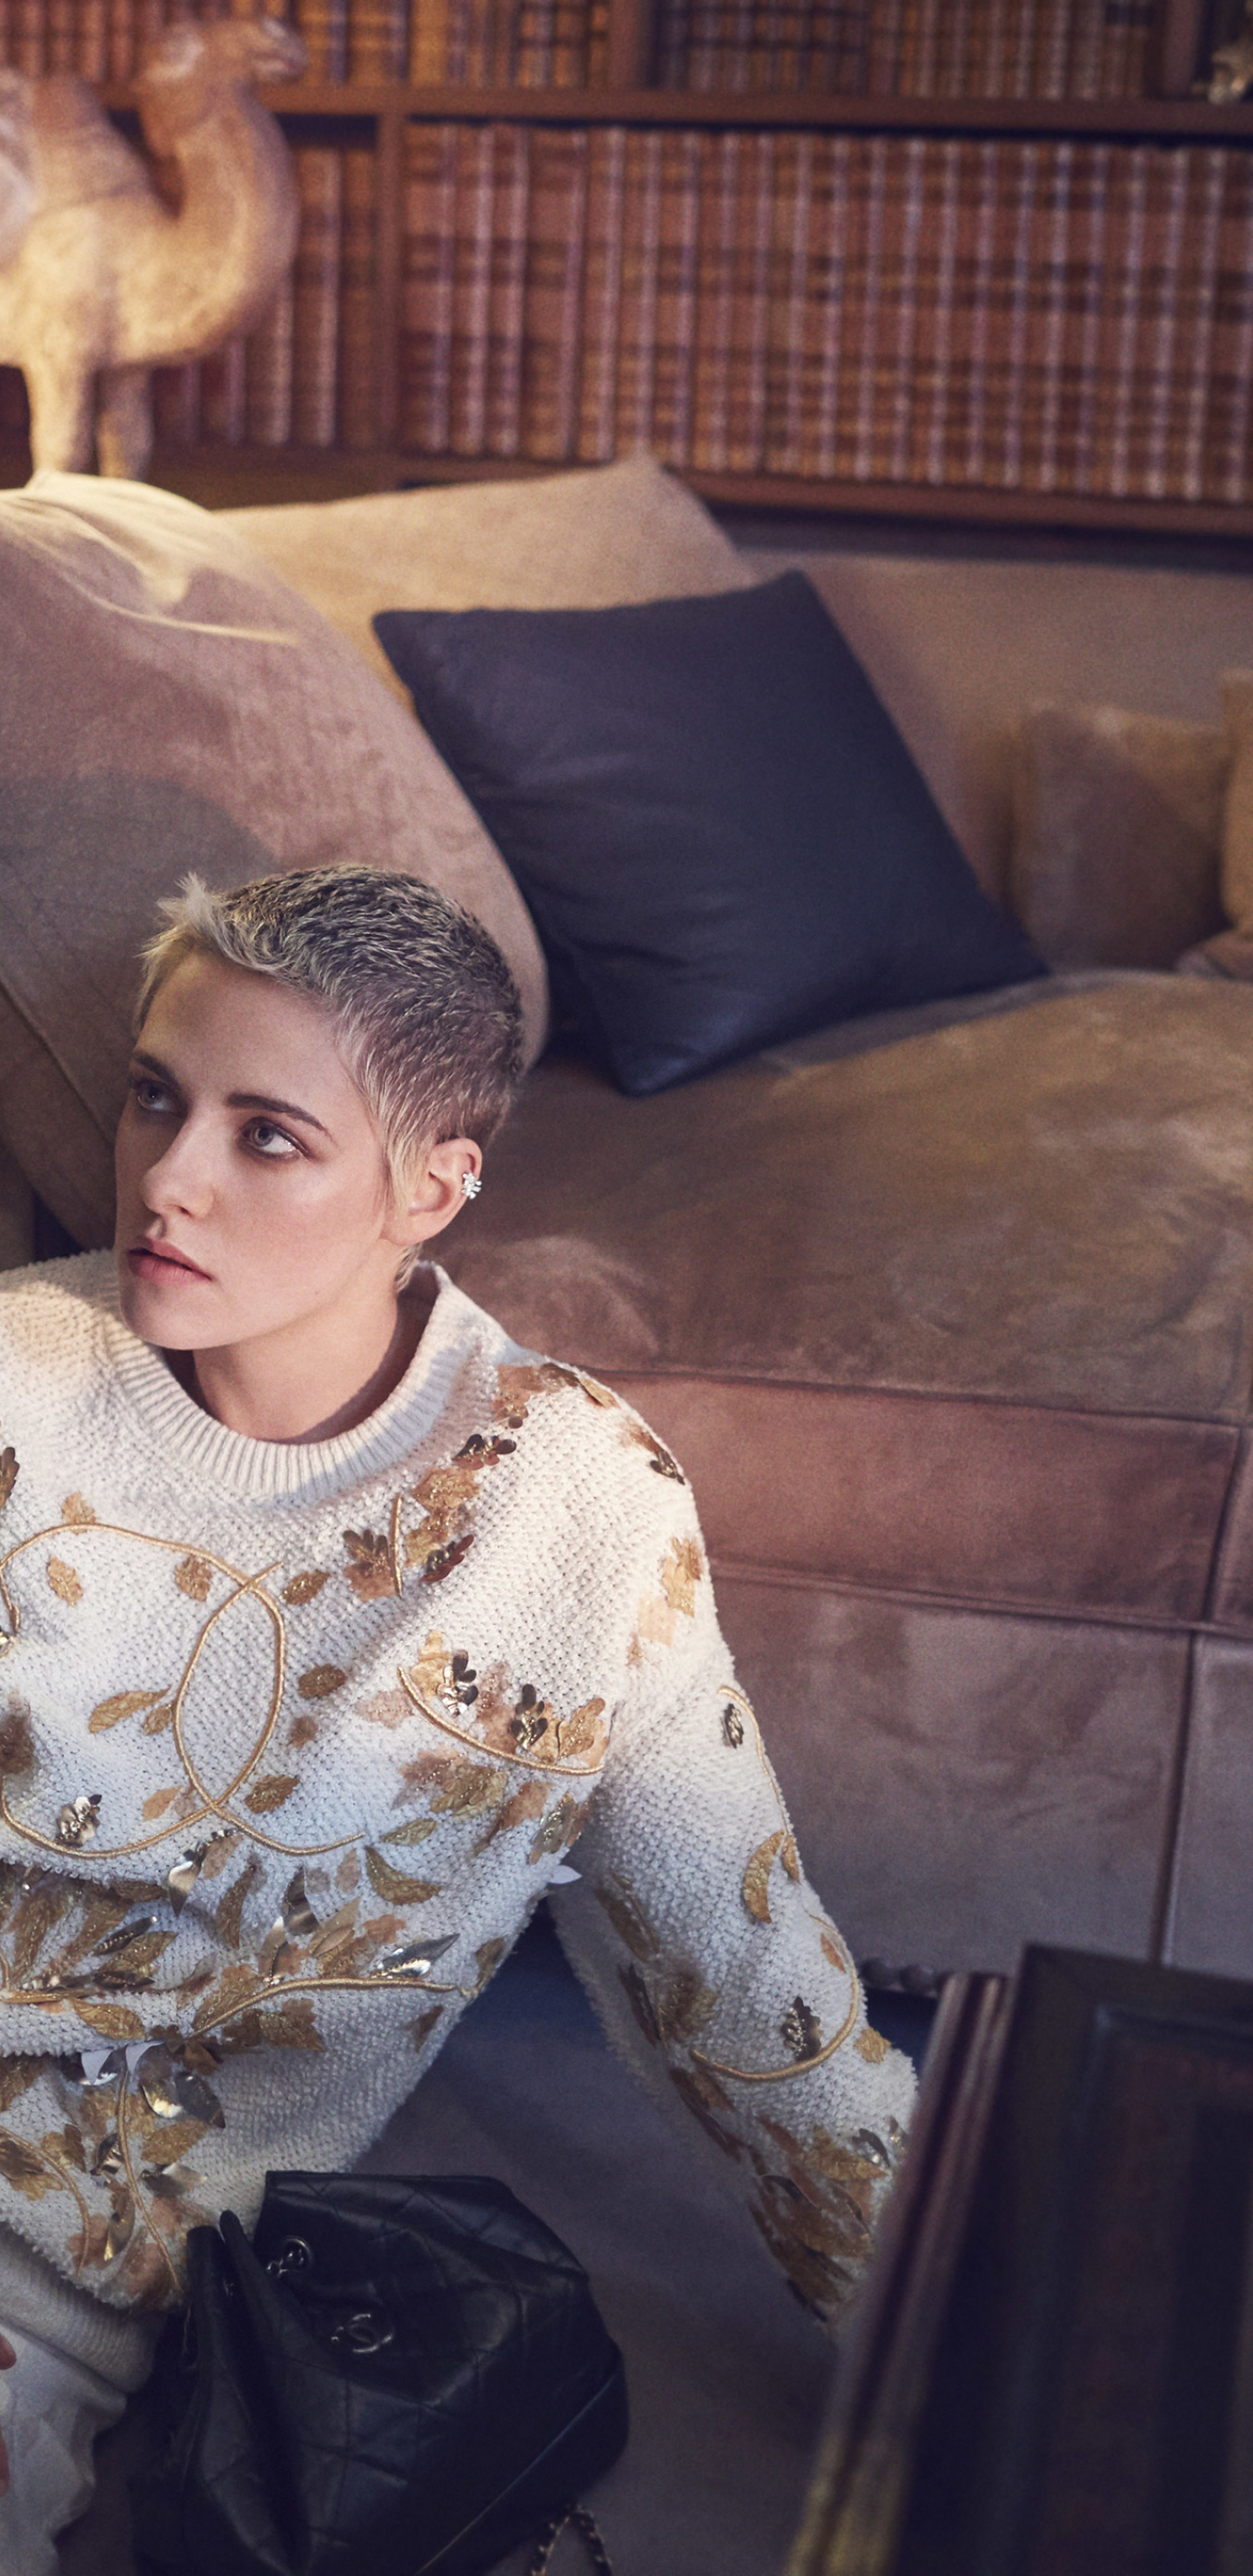 1440x2960 Kristen Stewart Short Hair 2017 Samsung Galaxy Note 9 8 S9 S8 S8 Qhd Wallpaper Hd Celebrities 4k Wallpapers Images Photos And Background